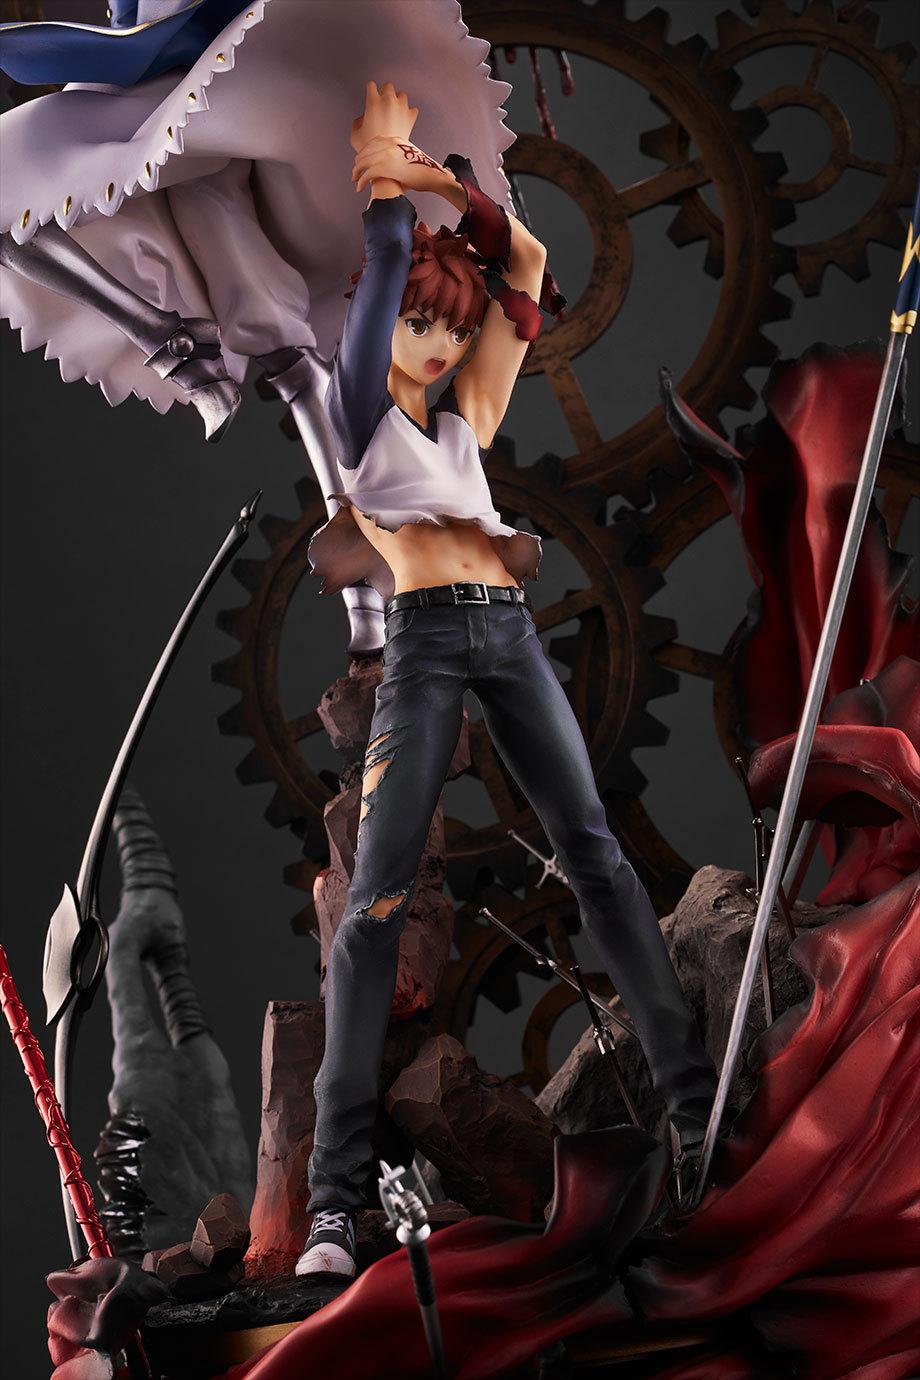 Fate/stay night 15周年纪念Figure -轨迹- Aniplex+ 卫宫士郎